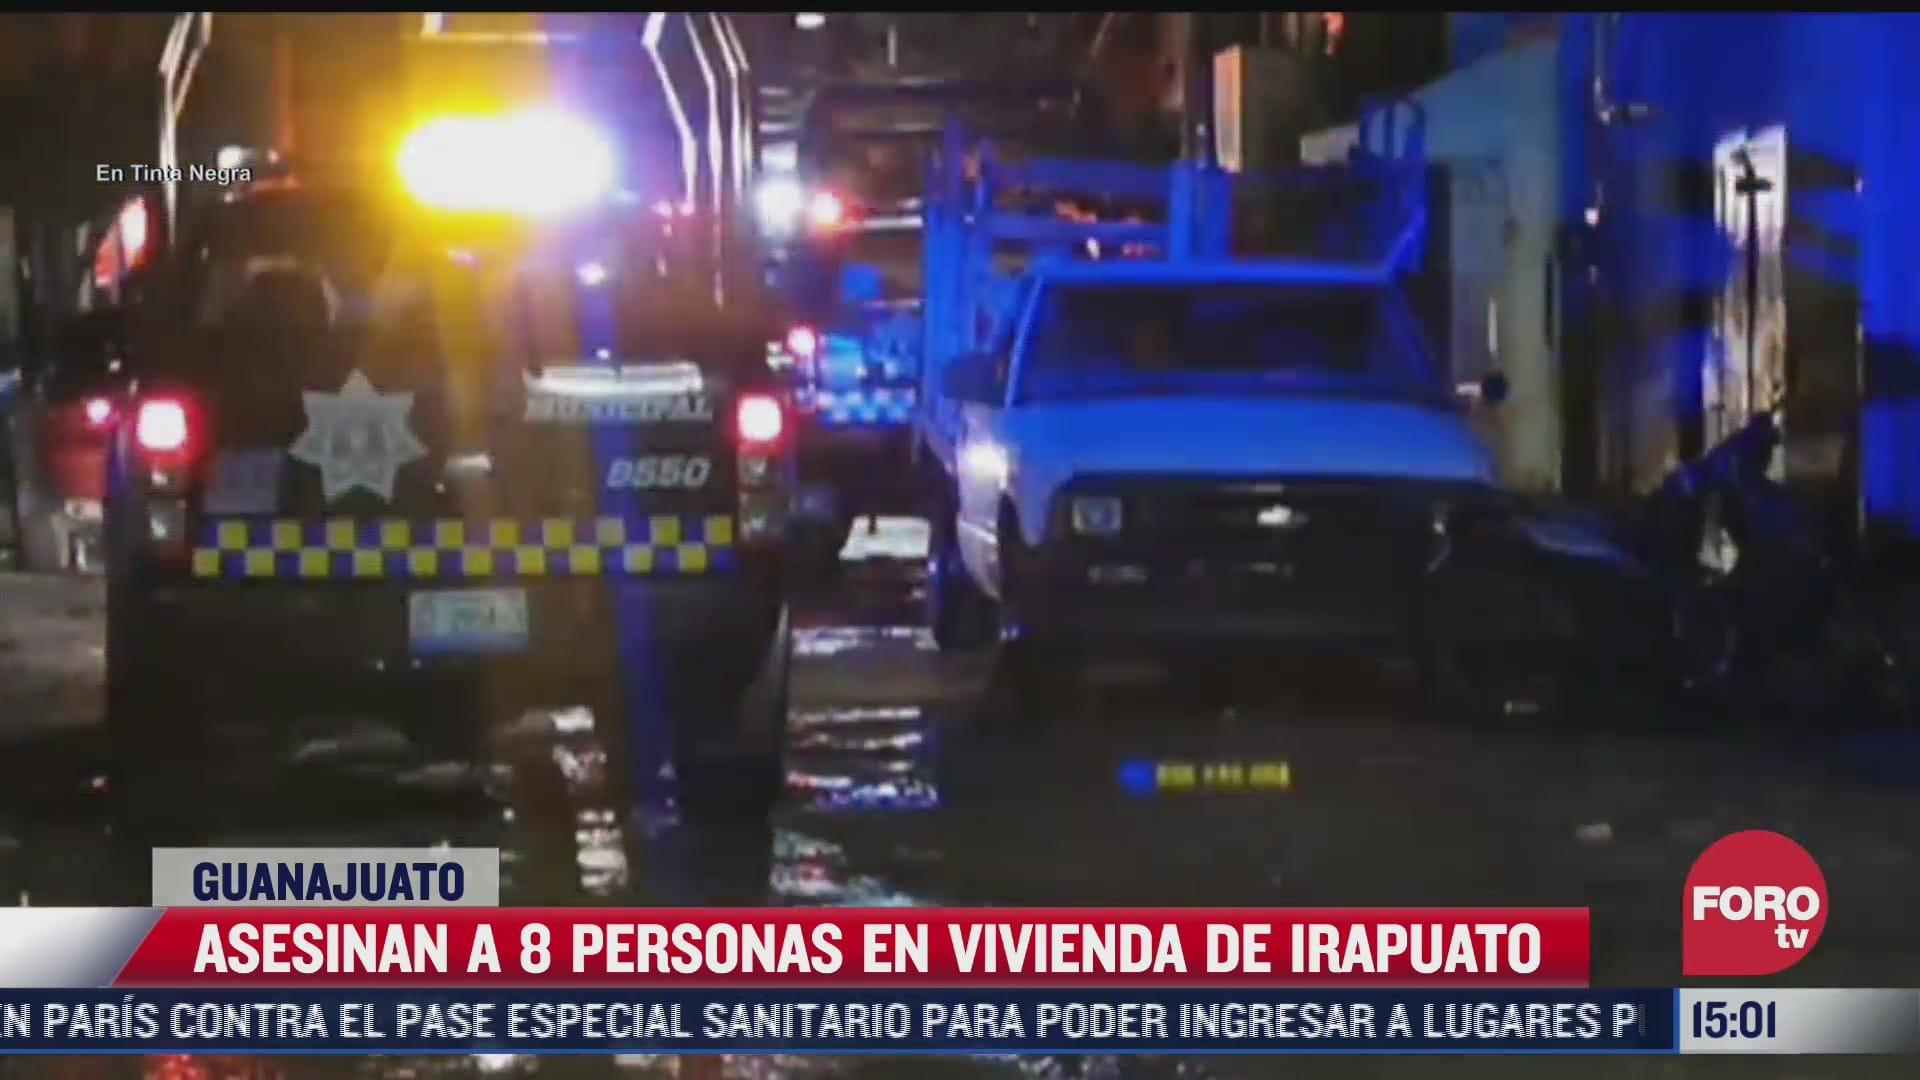 asesinan a 8 personas en vivienda de irapuato guanajuato